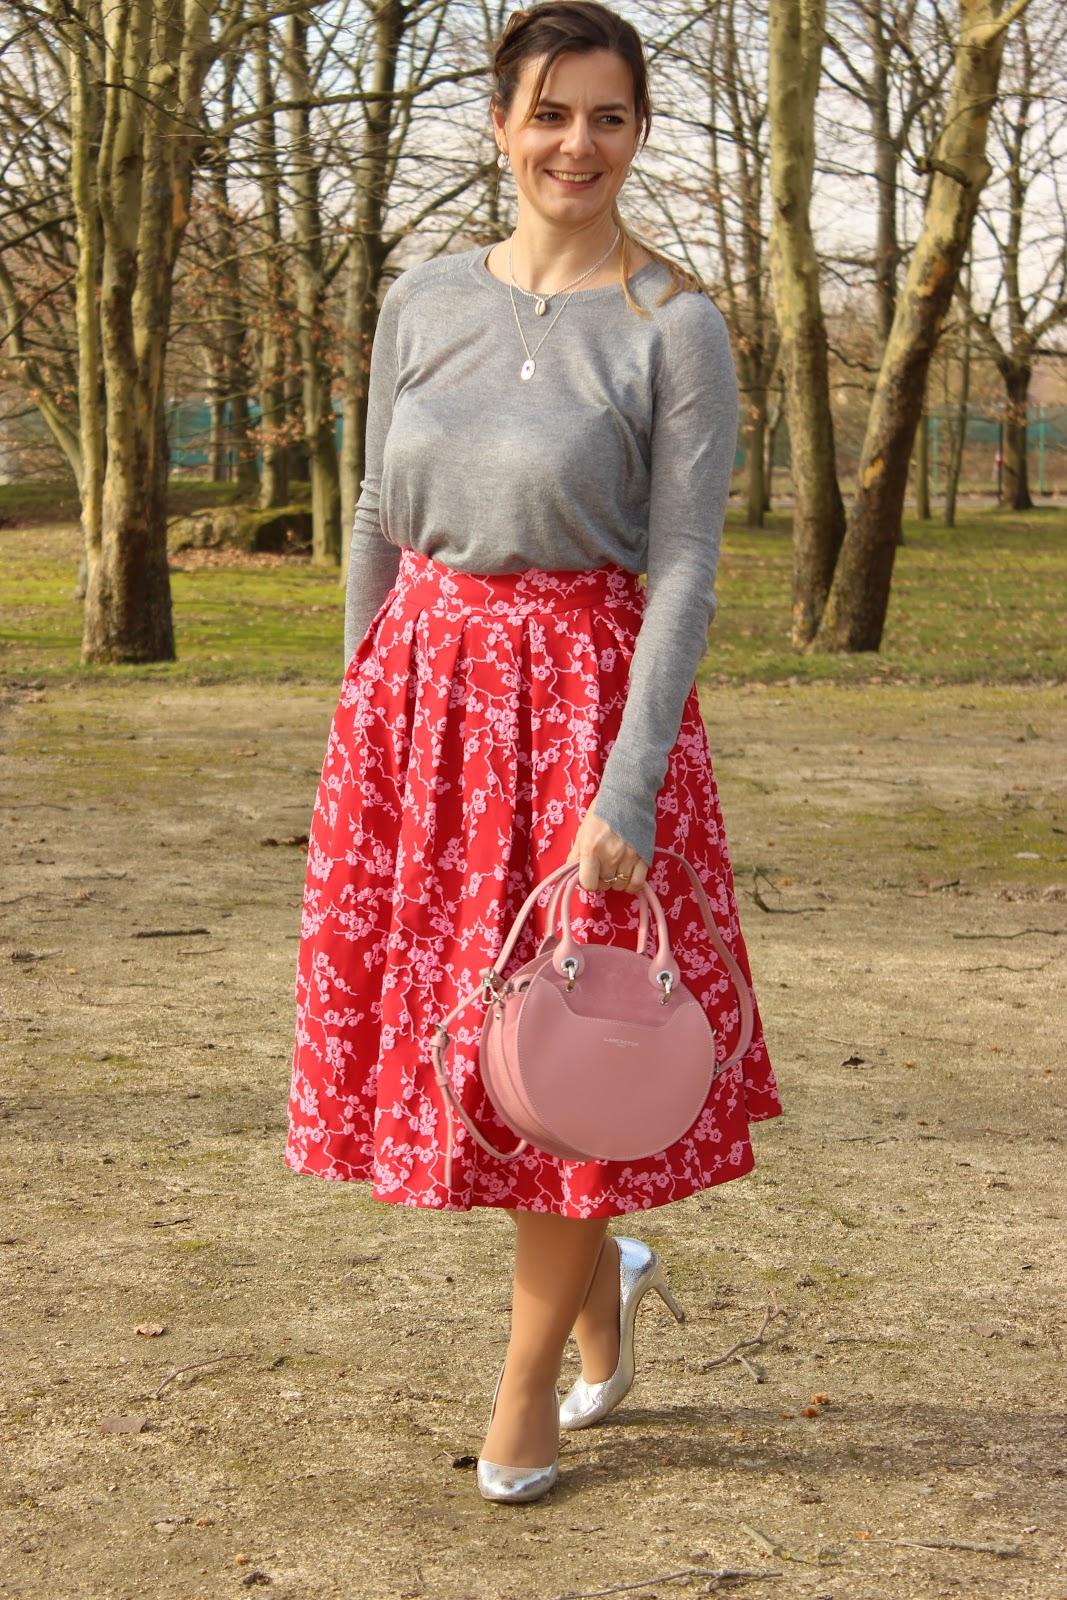 jupe rose tara jarmon, look du jour, les petites bulles de ma vie